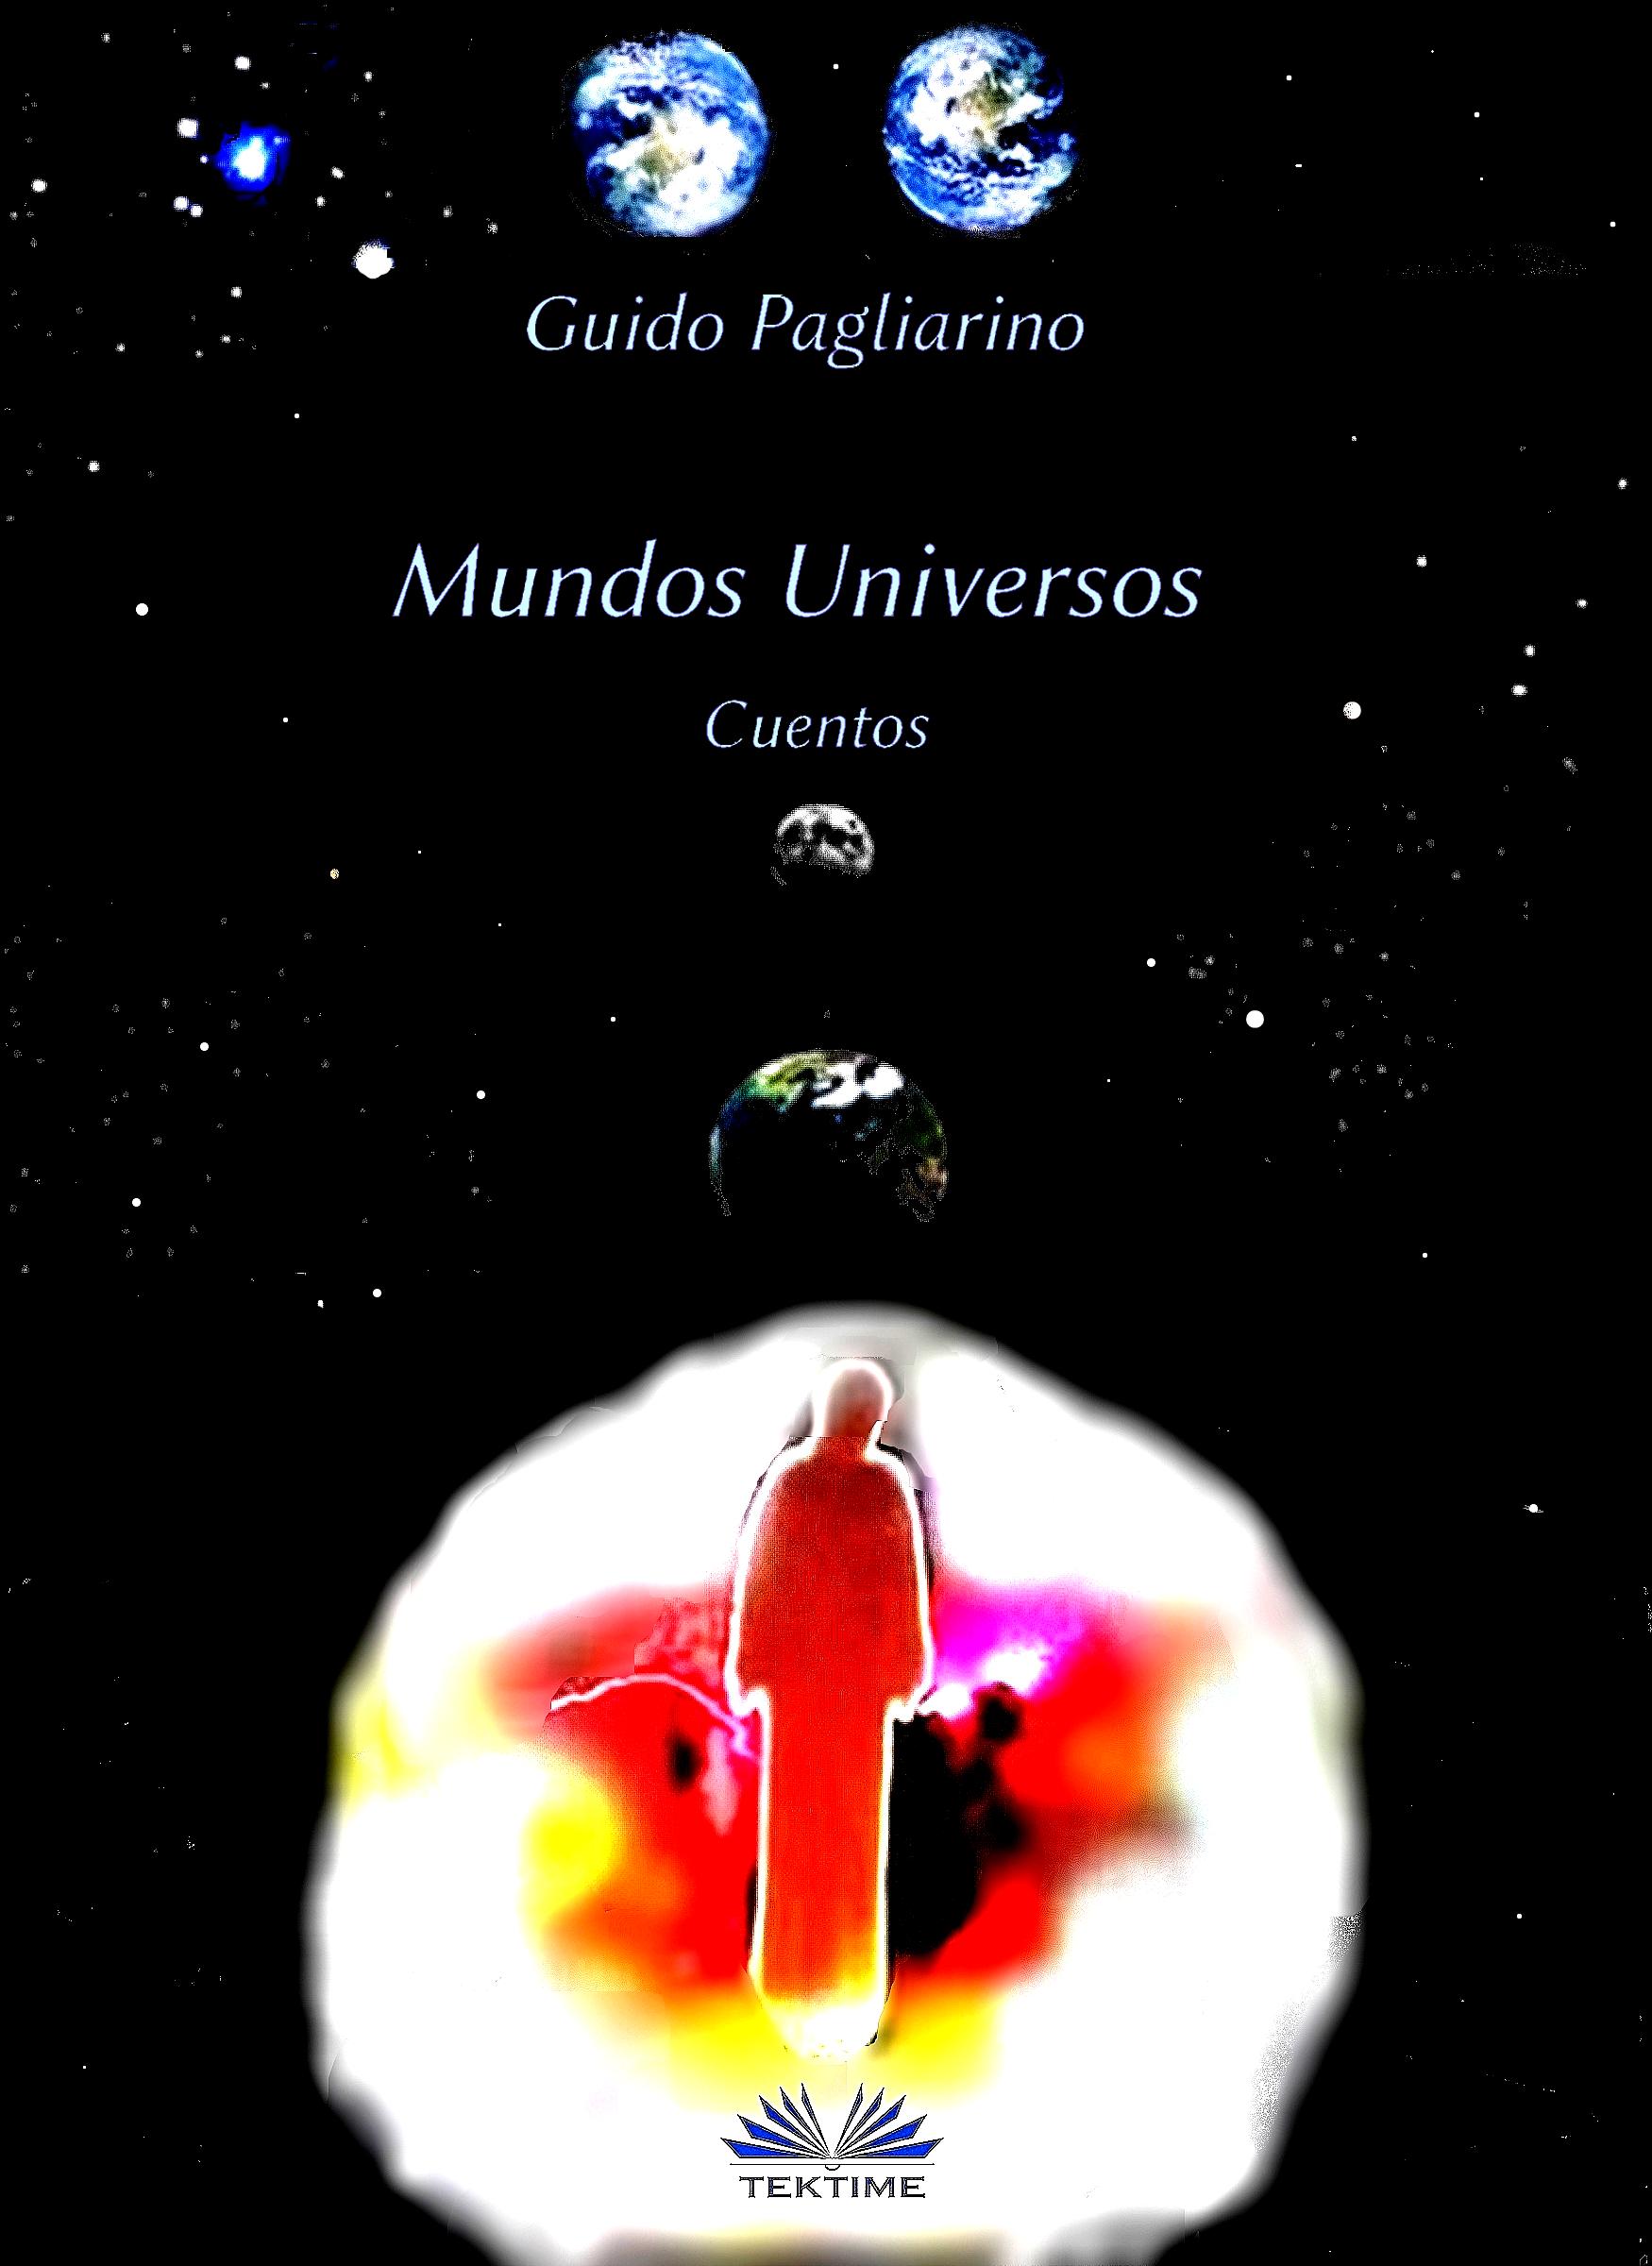 Mundos Universos